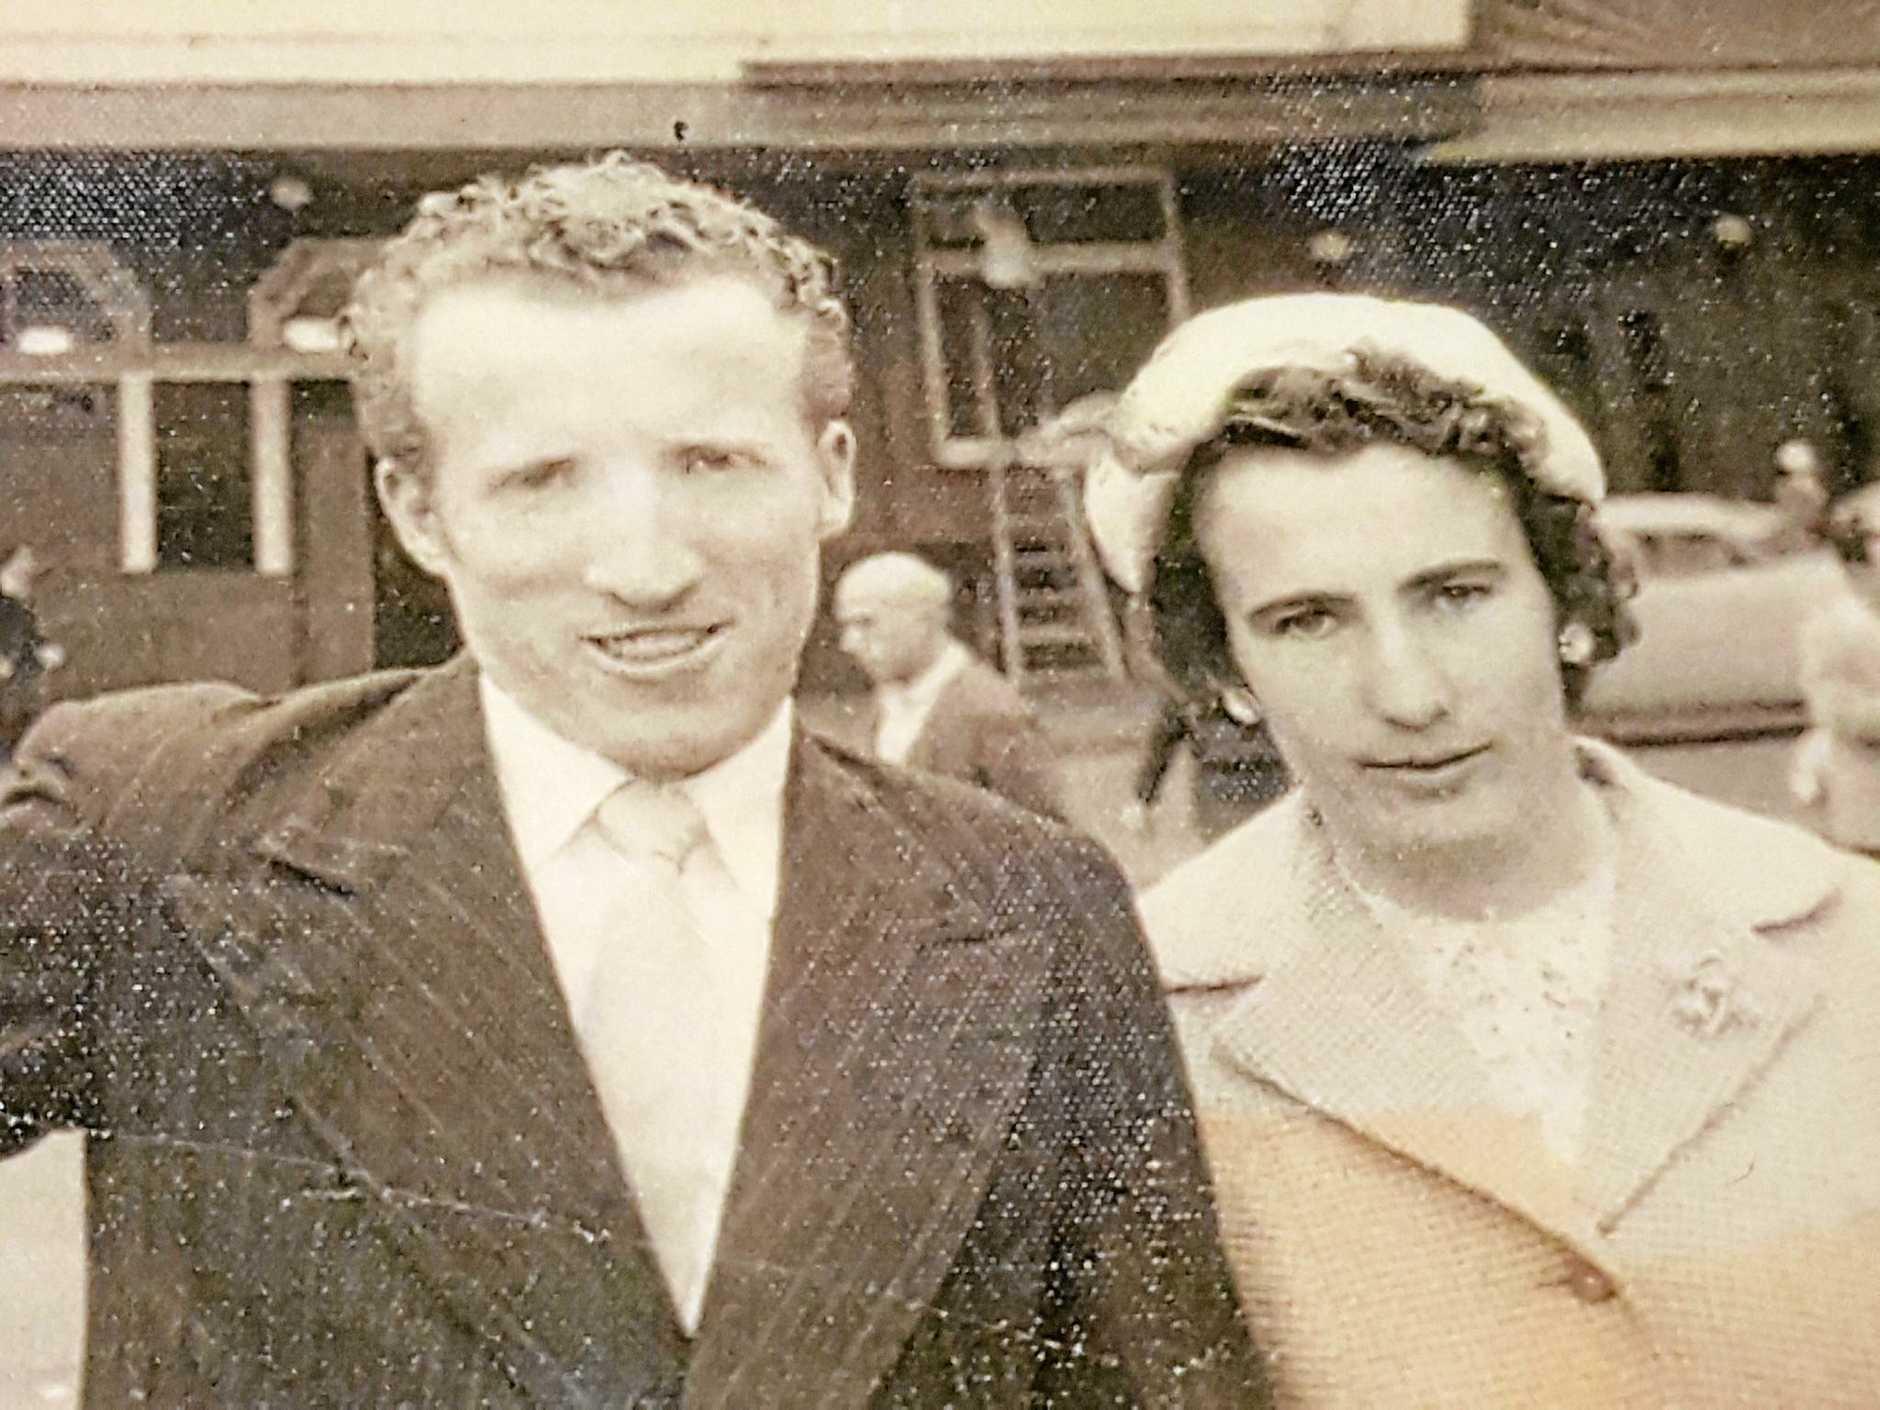 George and Nita Williamson on their wedding day.